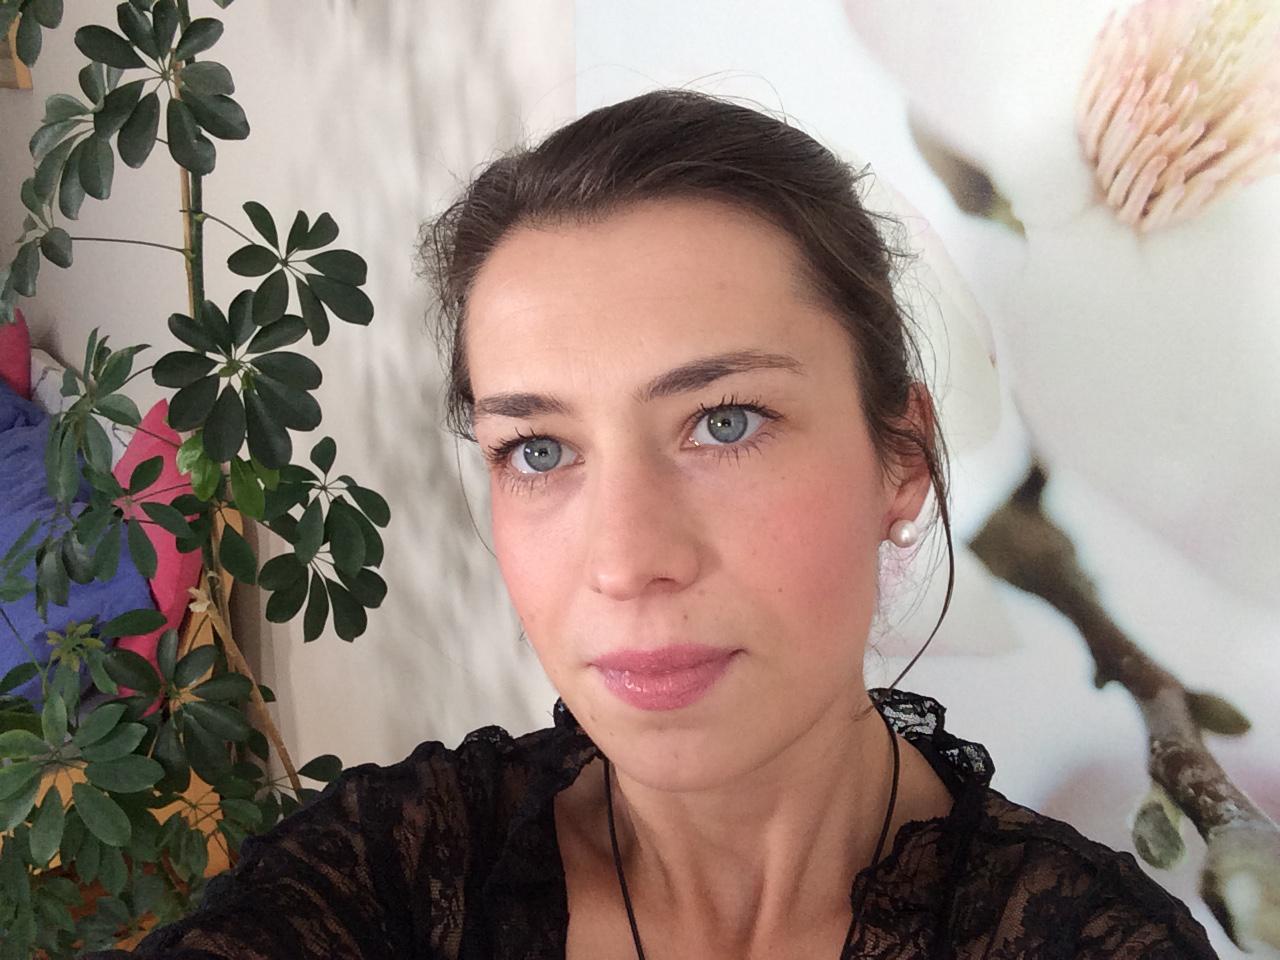 Ersties.com - Freya: The Art of Presentation 3